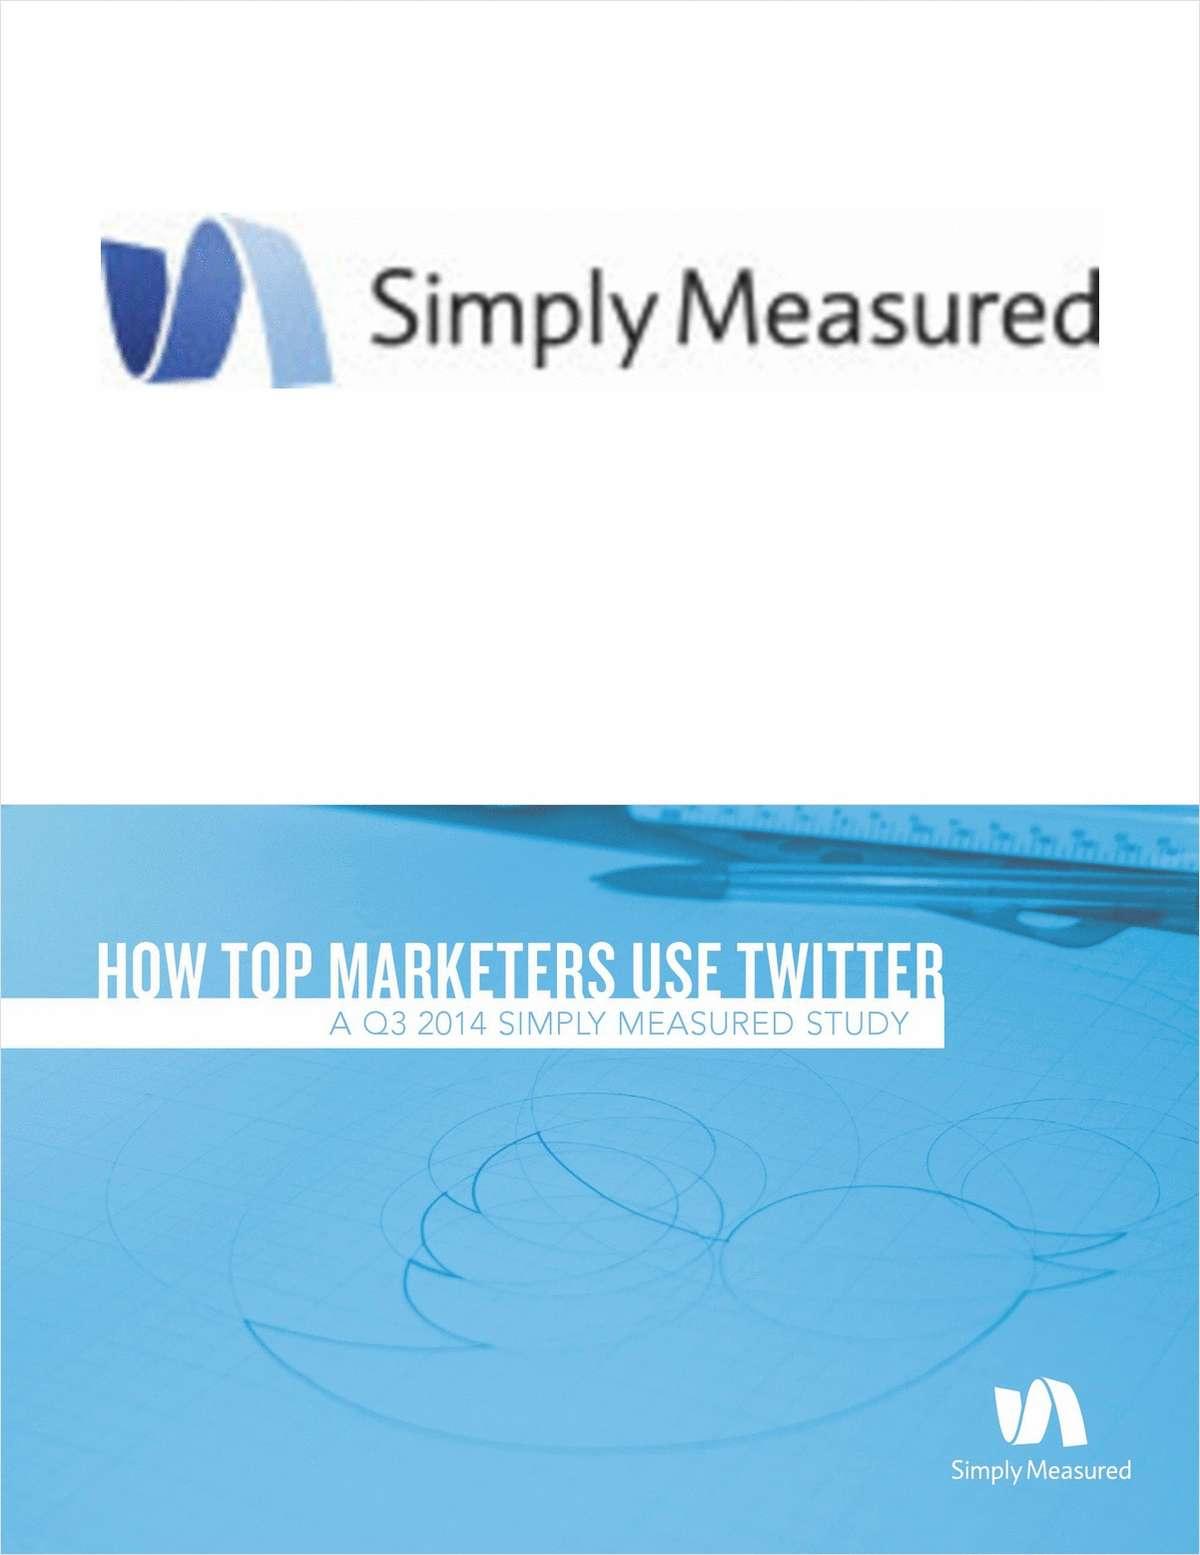 Quarterly Twitter Network Study - Q3 2014